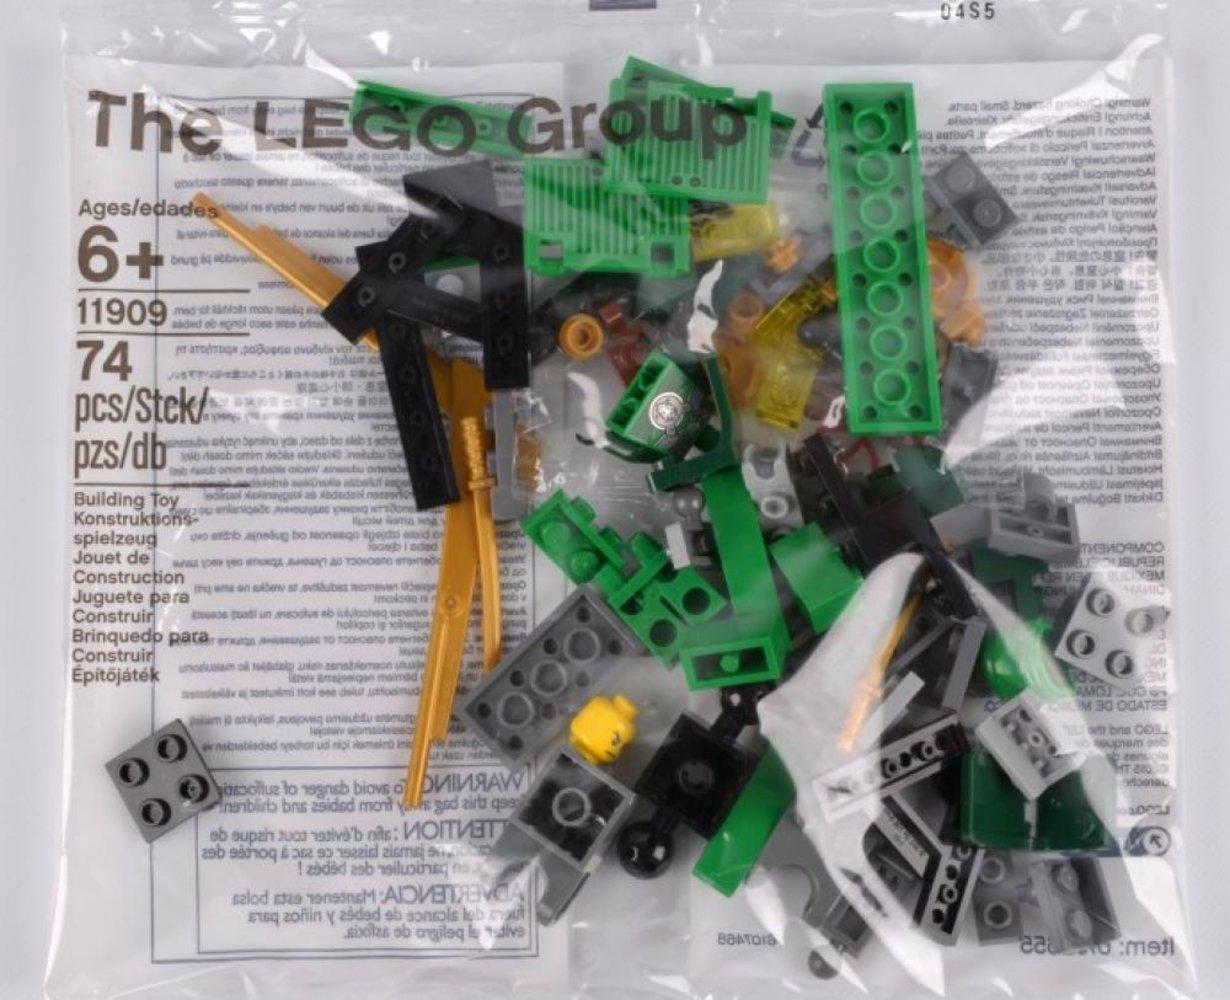 Ninjago: Build Your Own Adventure